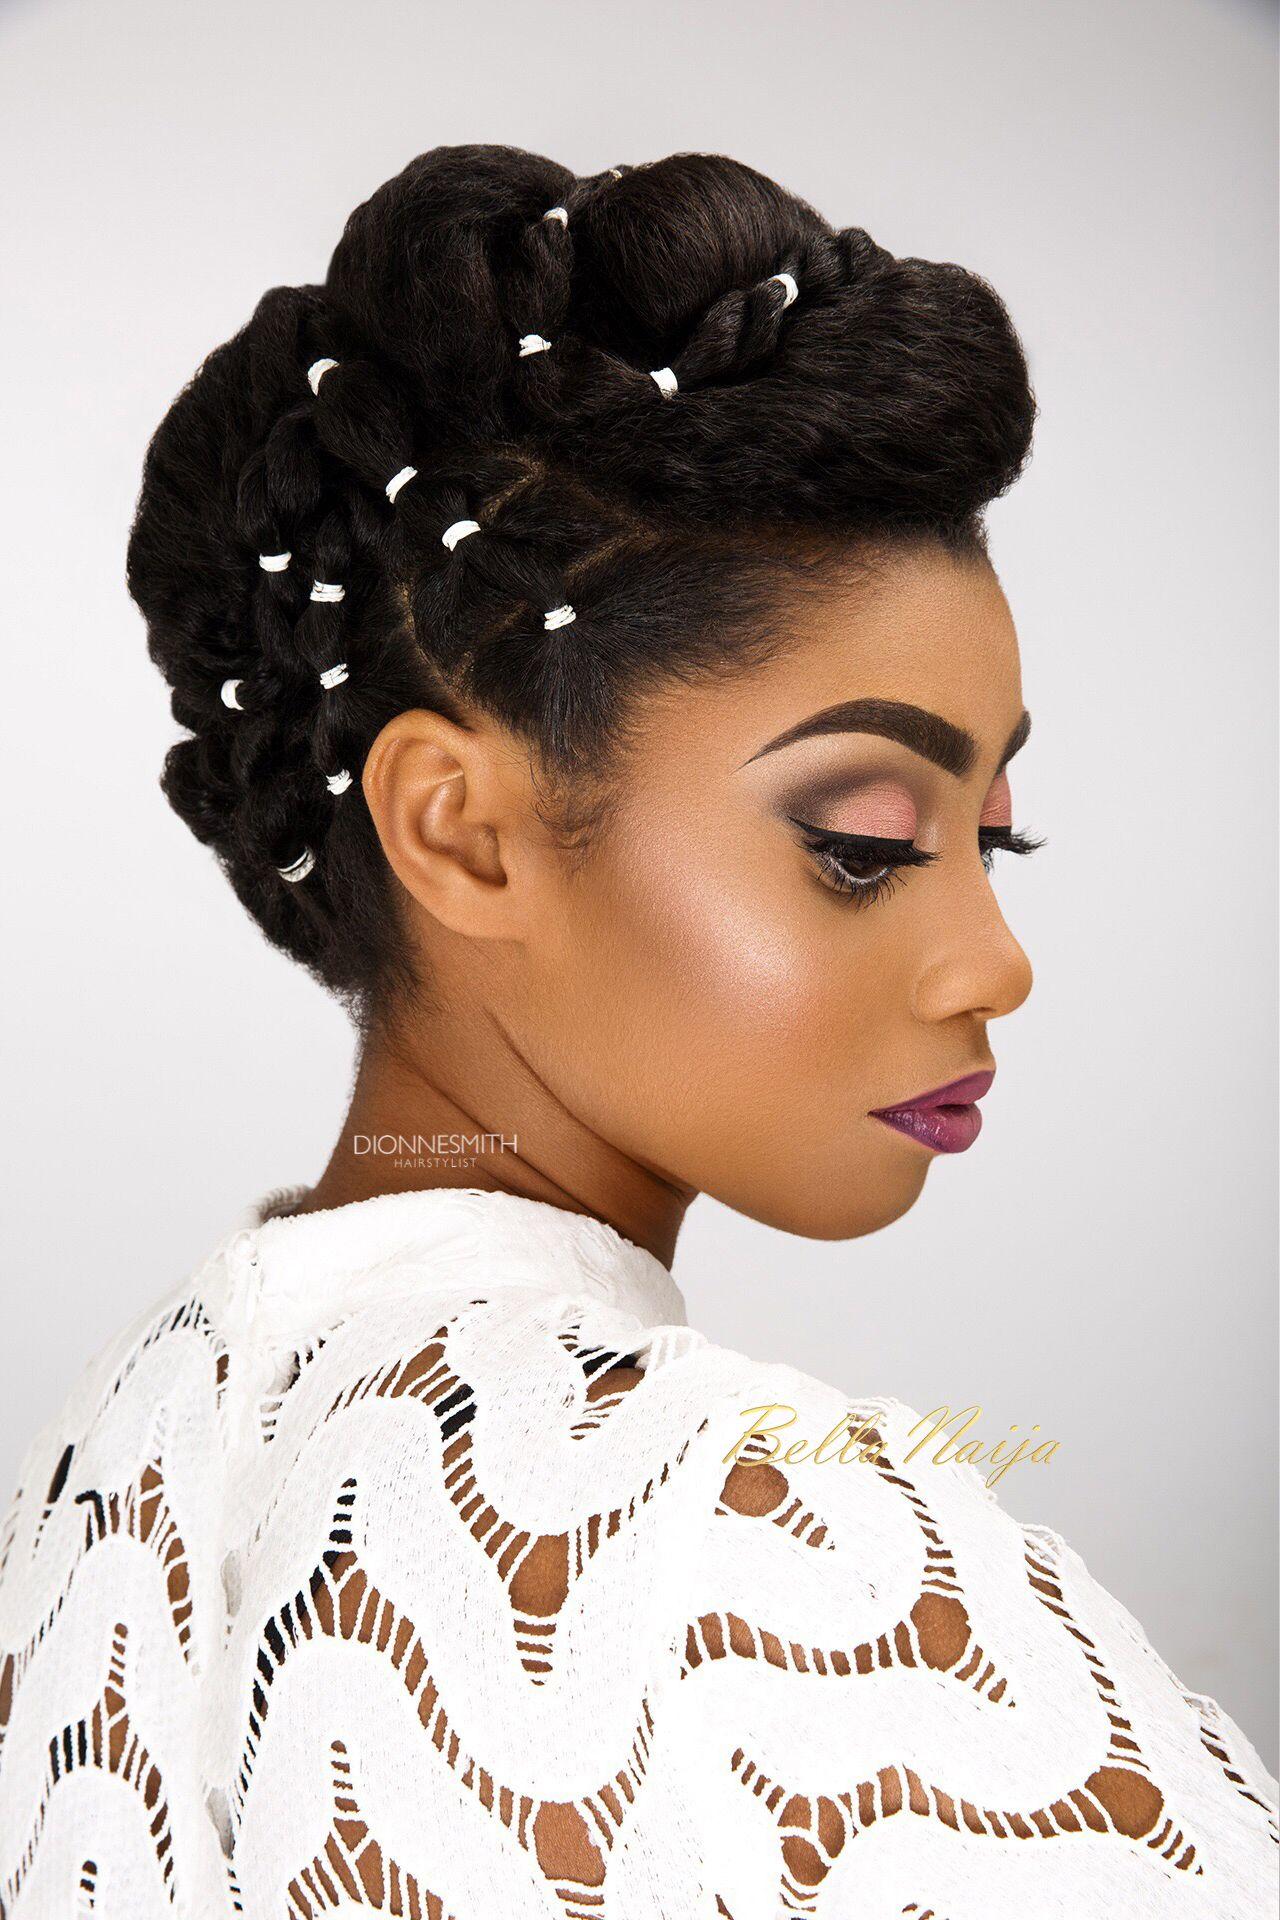 bn bridal beauty: international bridal hair specialist, dionne smith